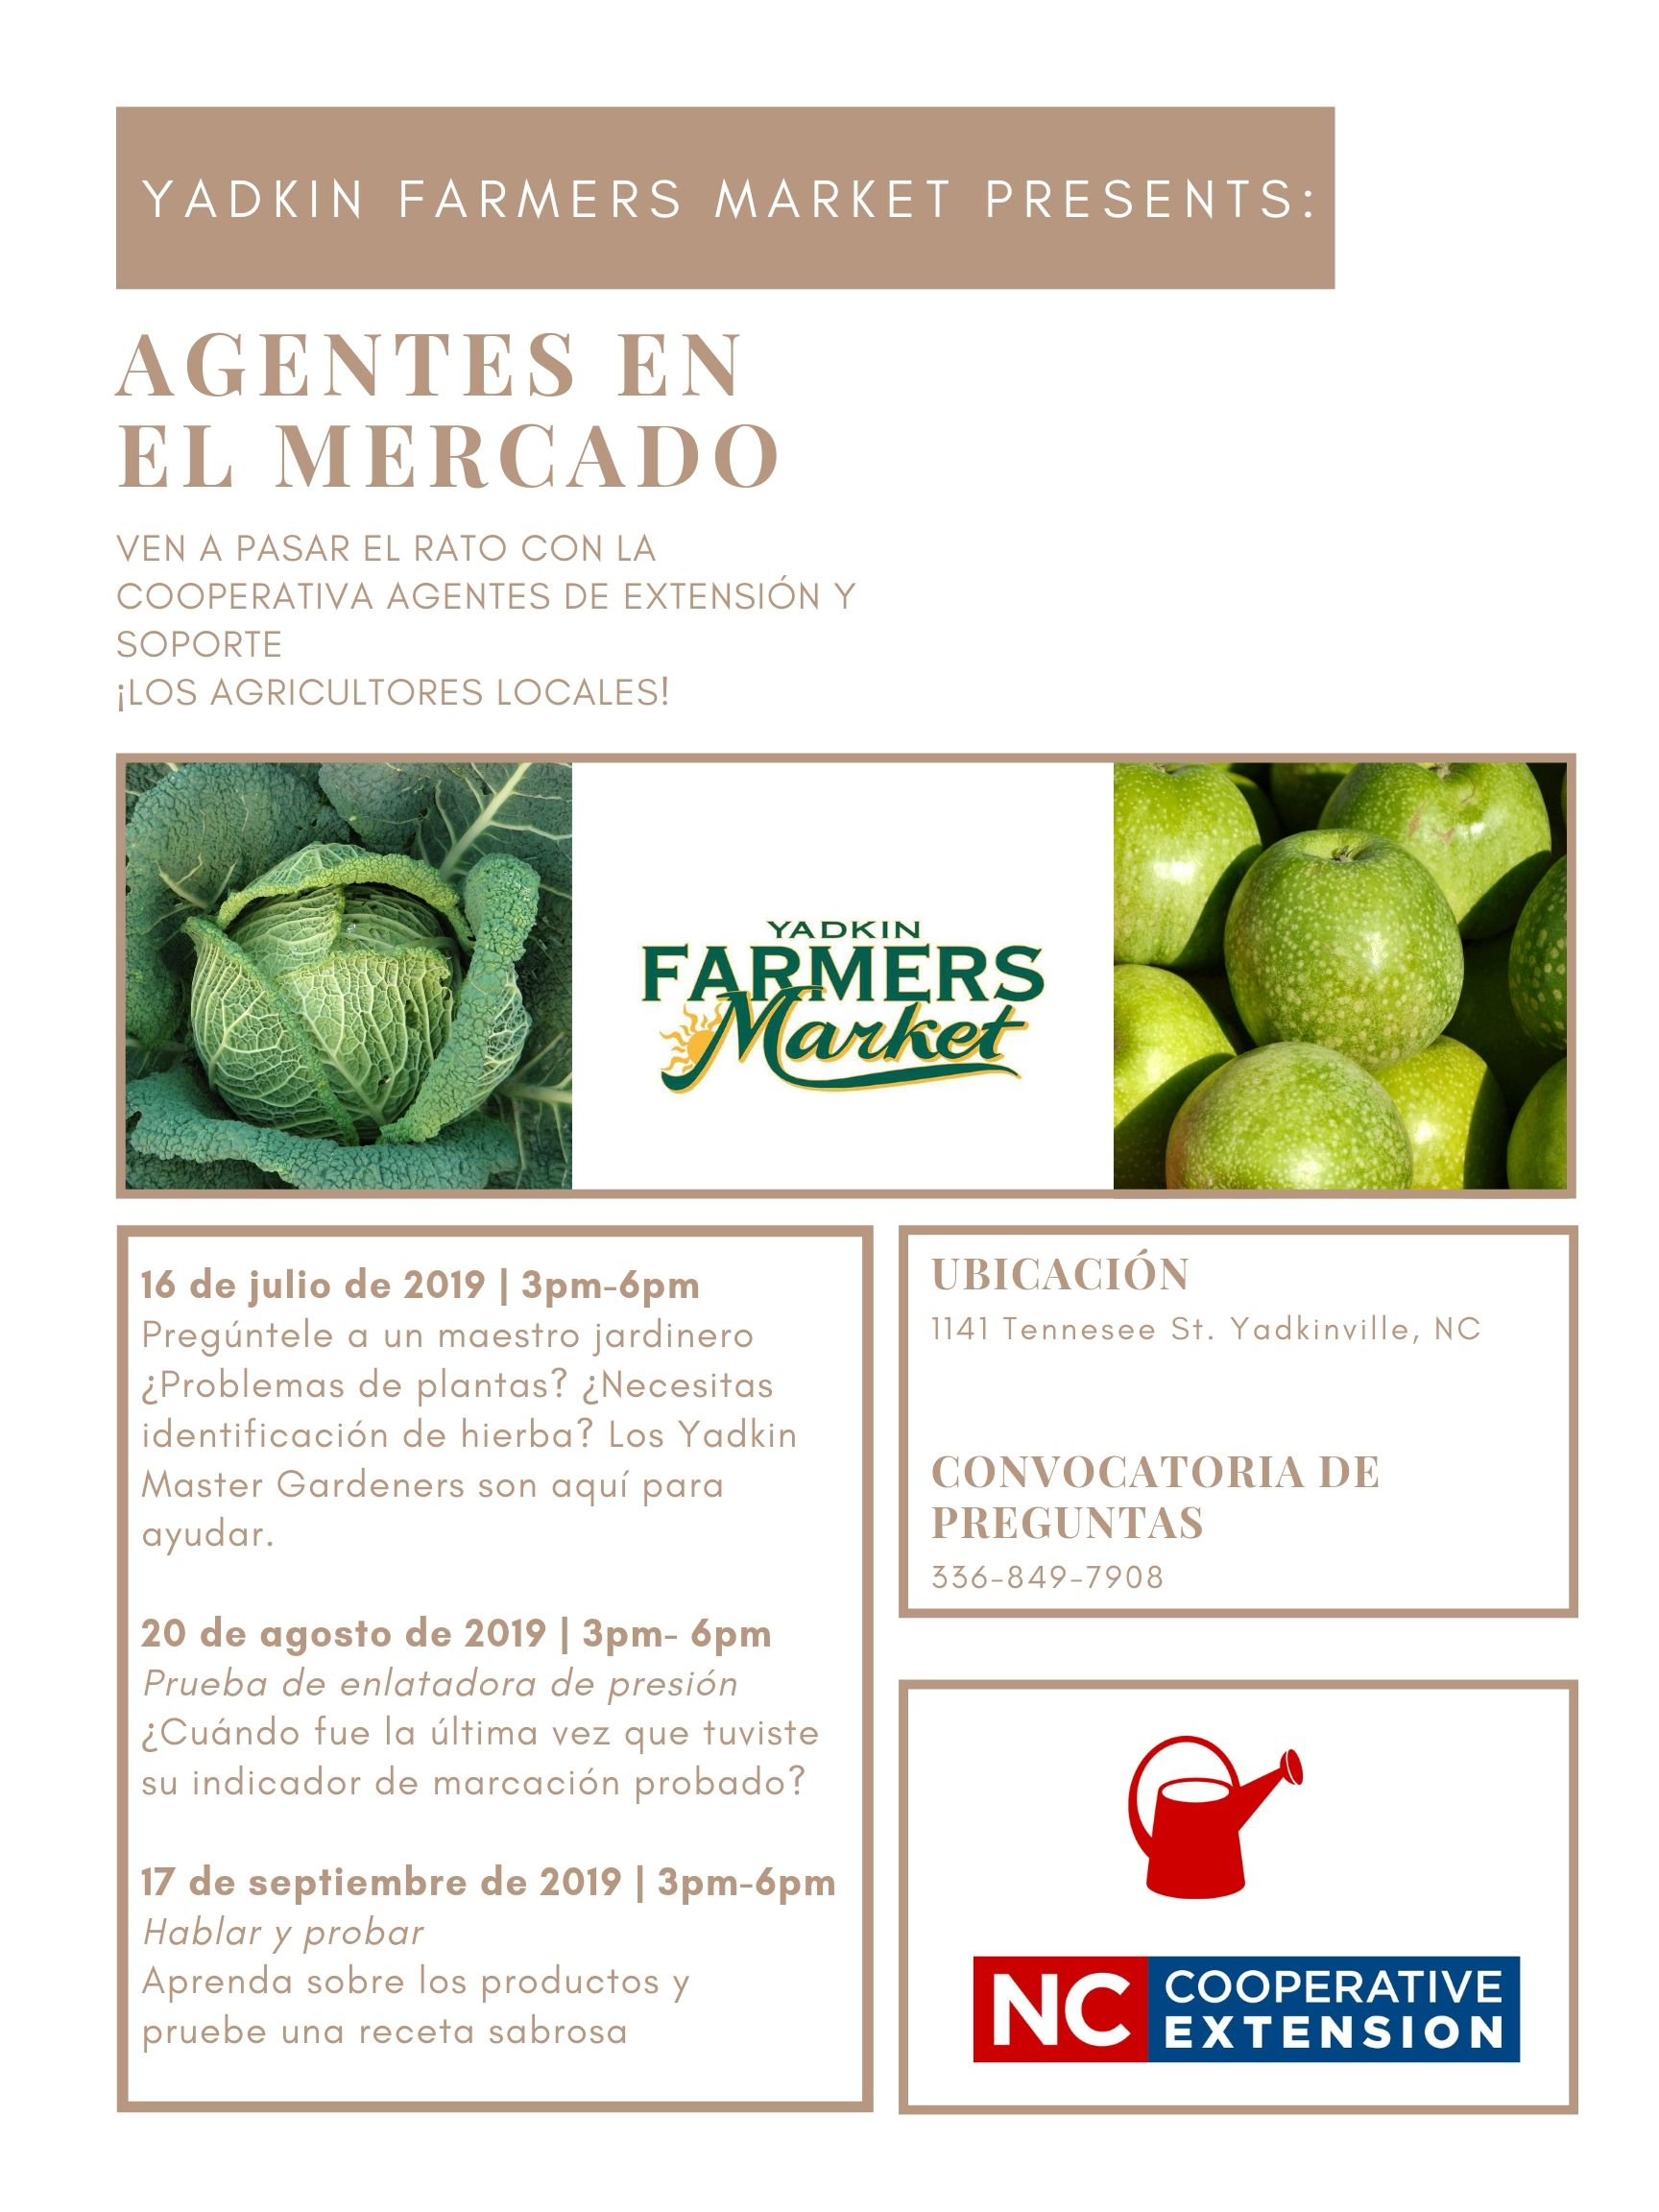 Event flyer image - Spanish version